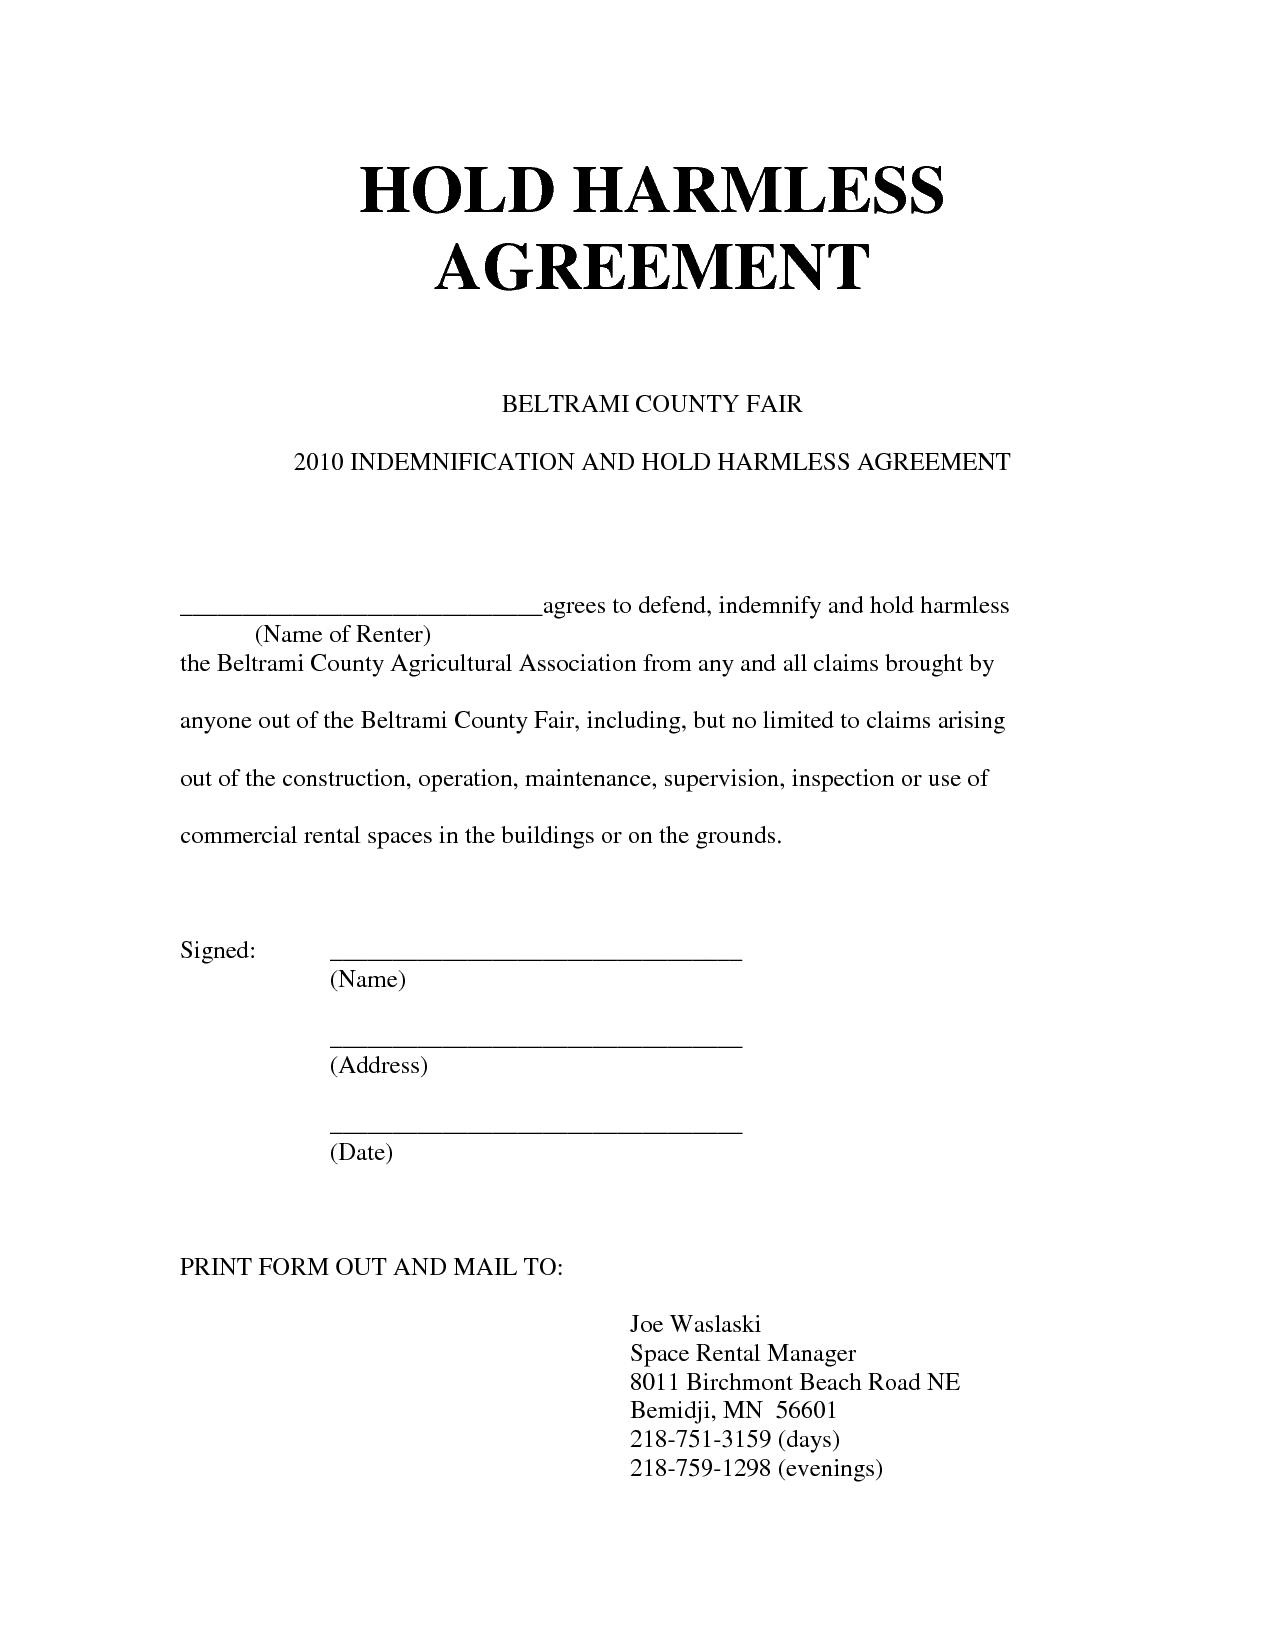 Hold Harmless Agreement Form